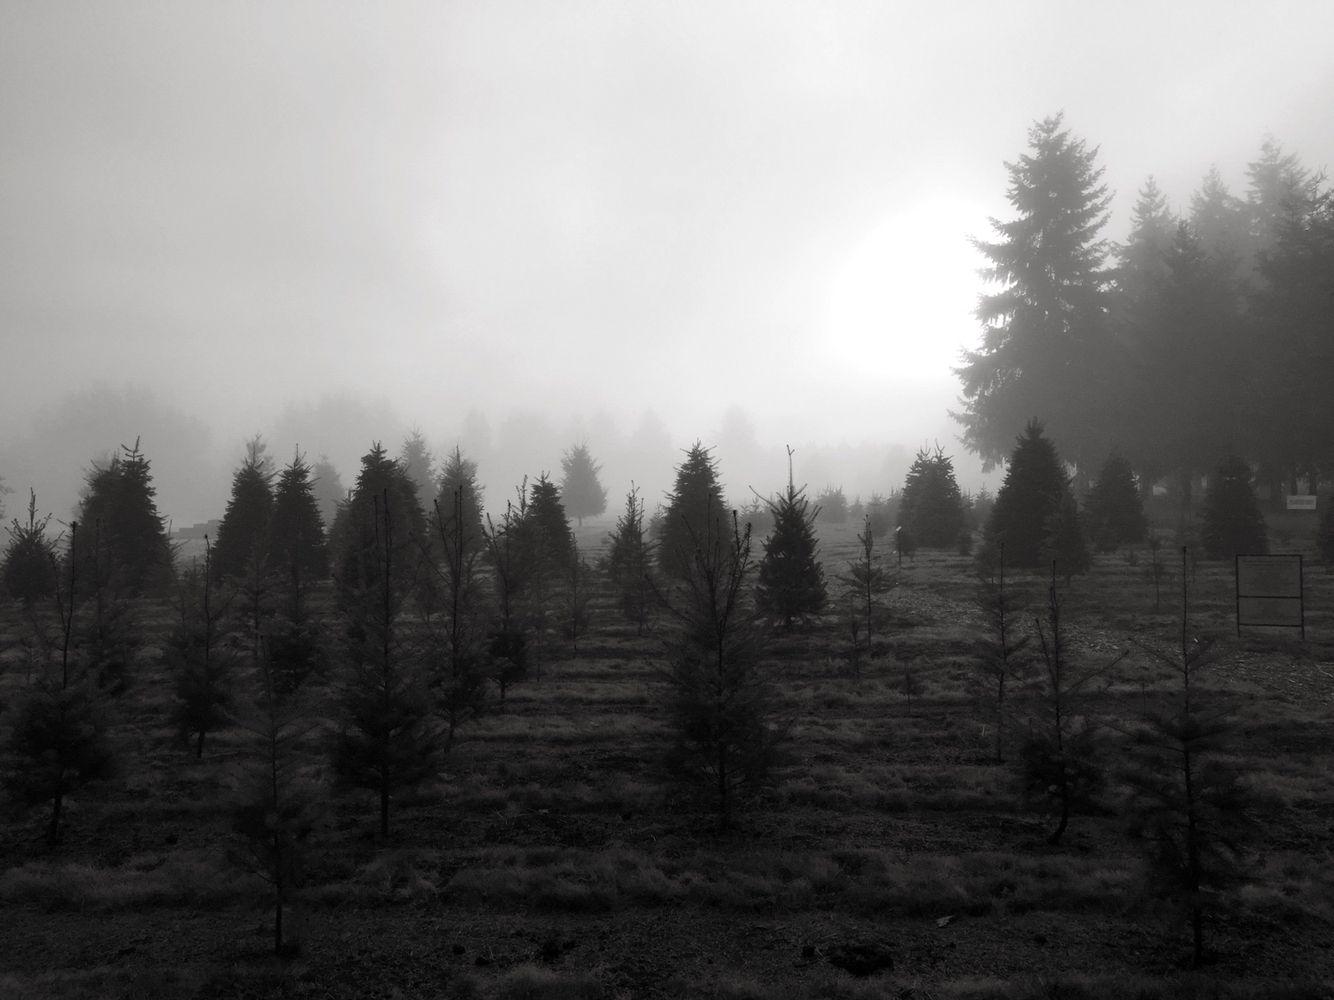 Misty morning in Oregon